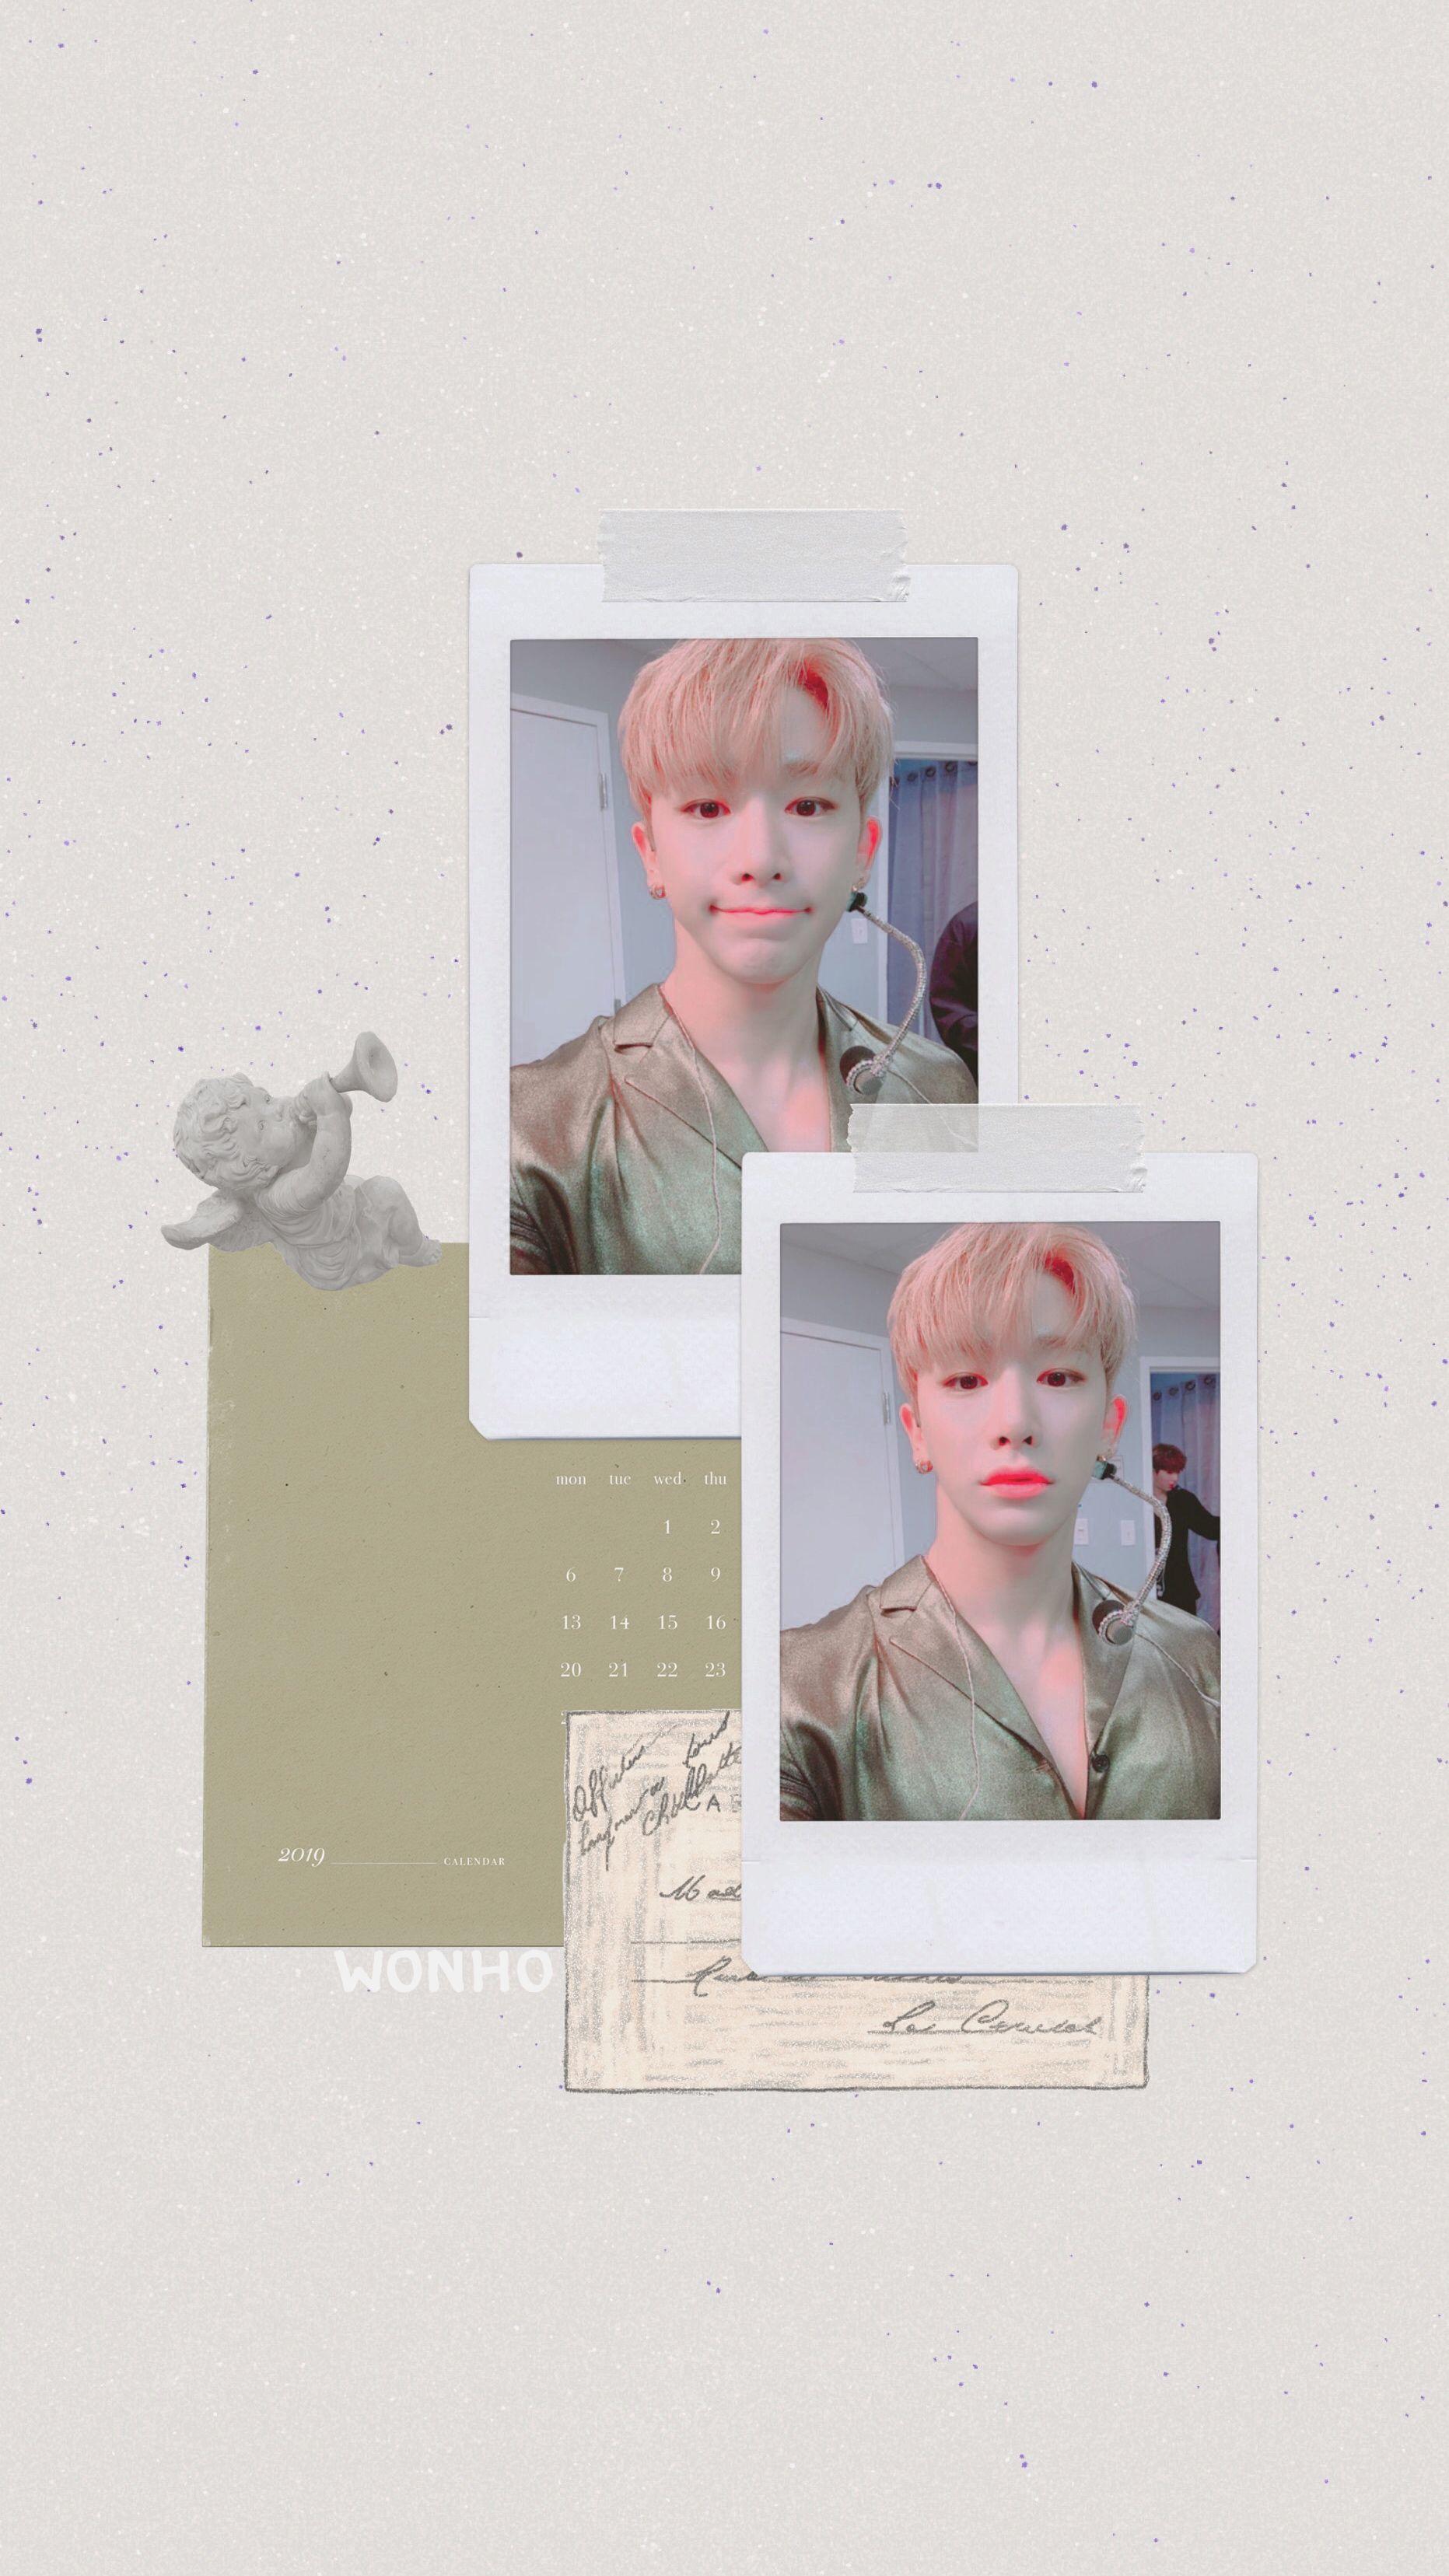 Pin By 𝙶𝙻𝙾𝚆𝚈𝙸𝚁𝙴𝙽 On Monsta X Kpop Wallpaper Aesthetic Pastel Wallpaper Monsta X Wonho